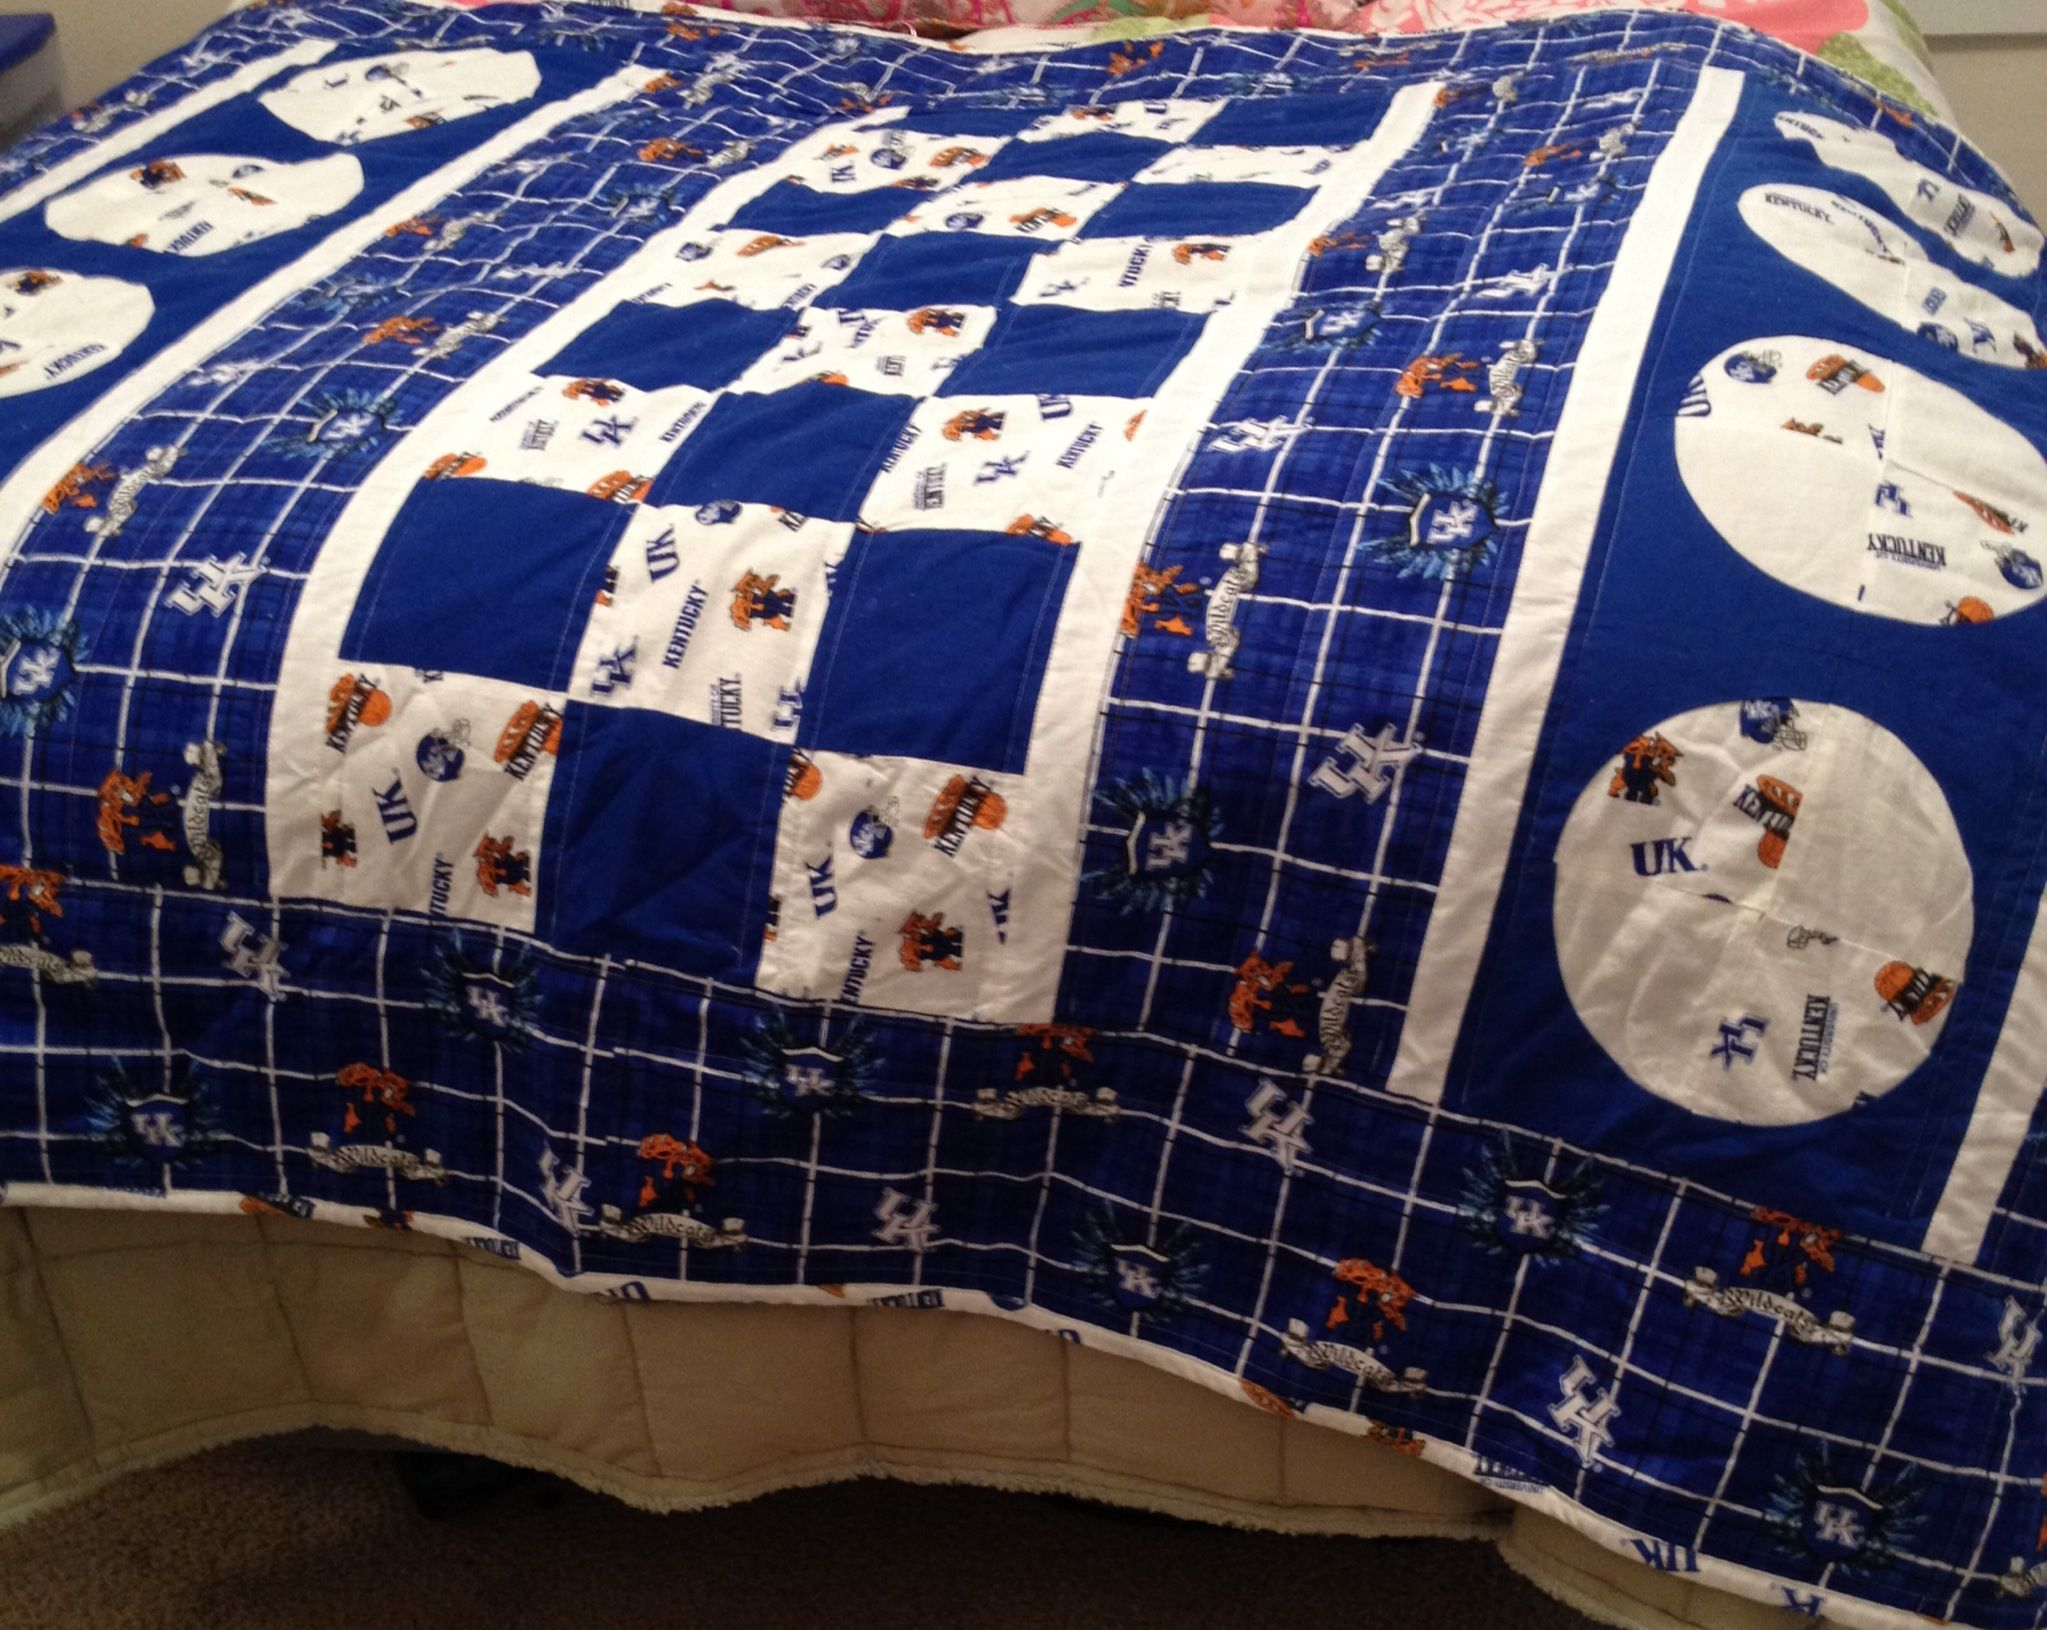 University of Kentucky quilt. Made by Tina Neathery of Quilting in ... : university of kentucky quilt - Adamdwight.com